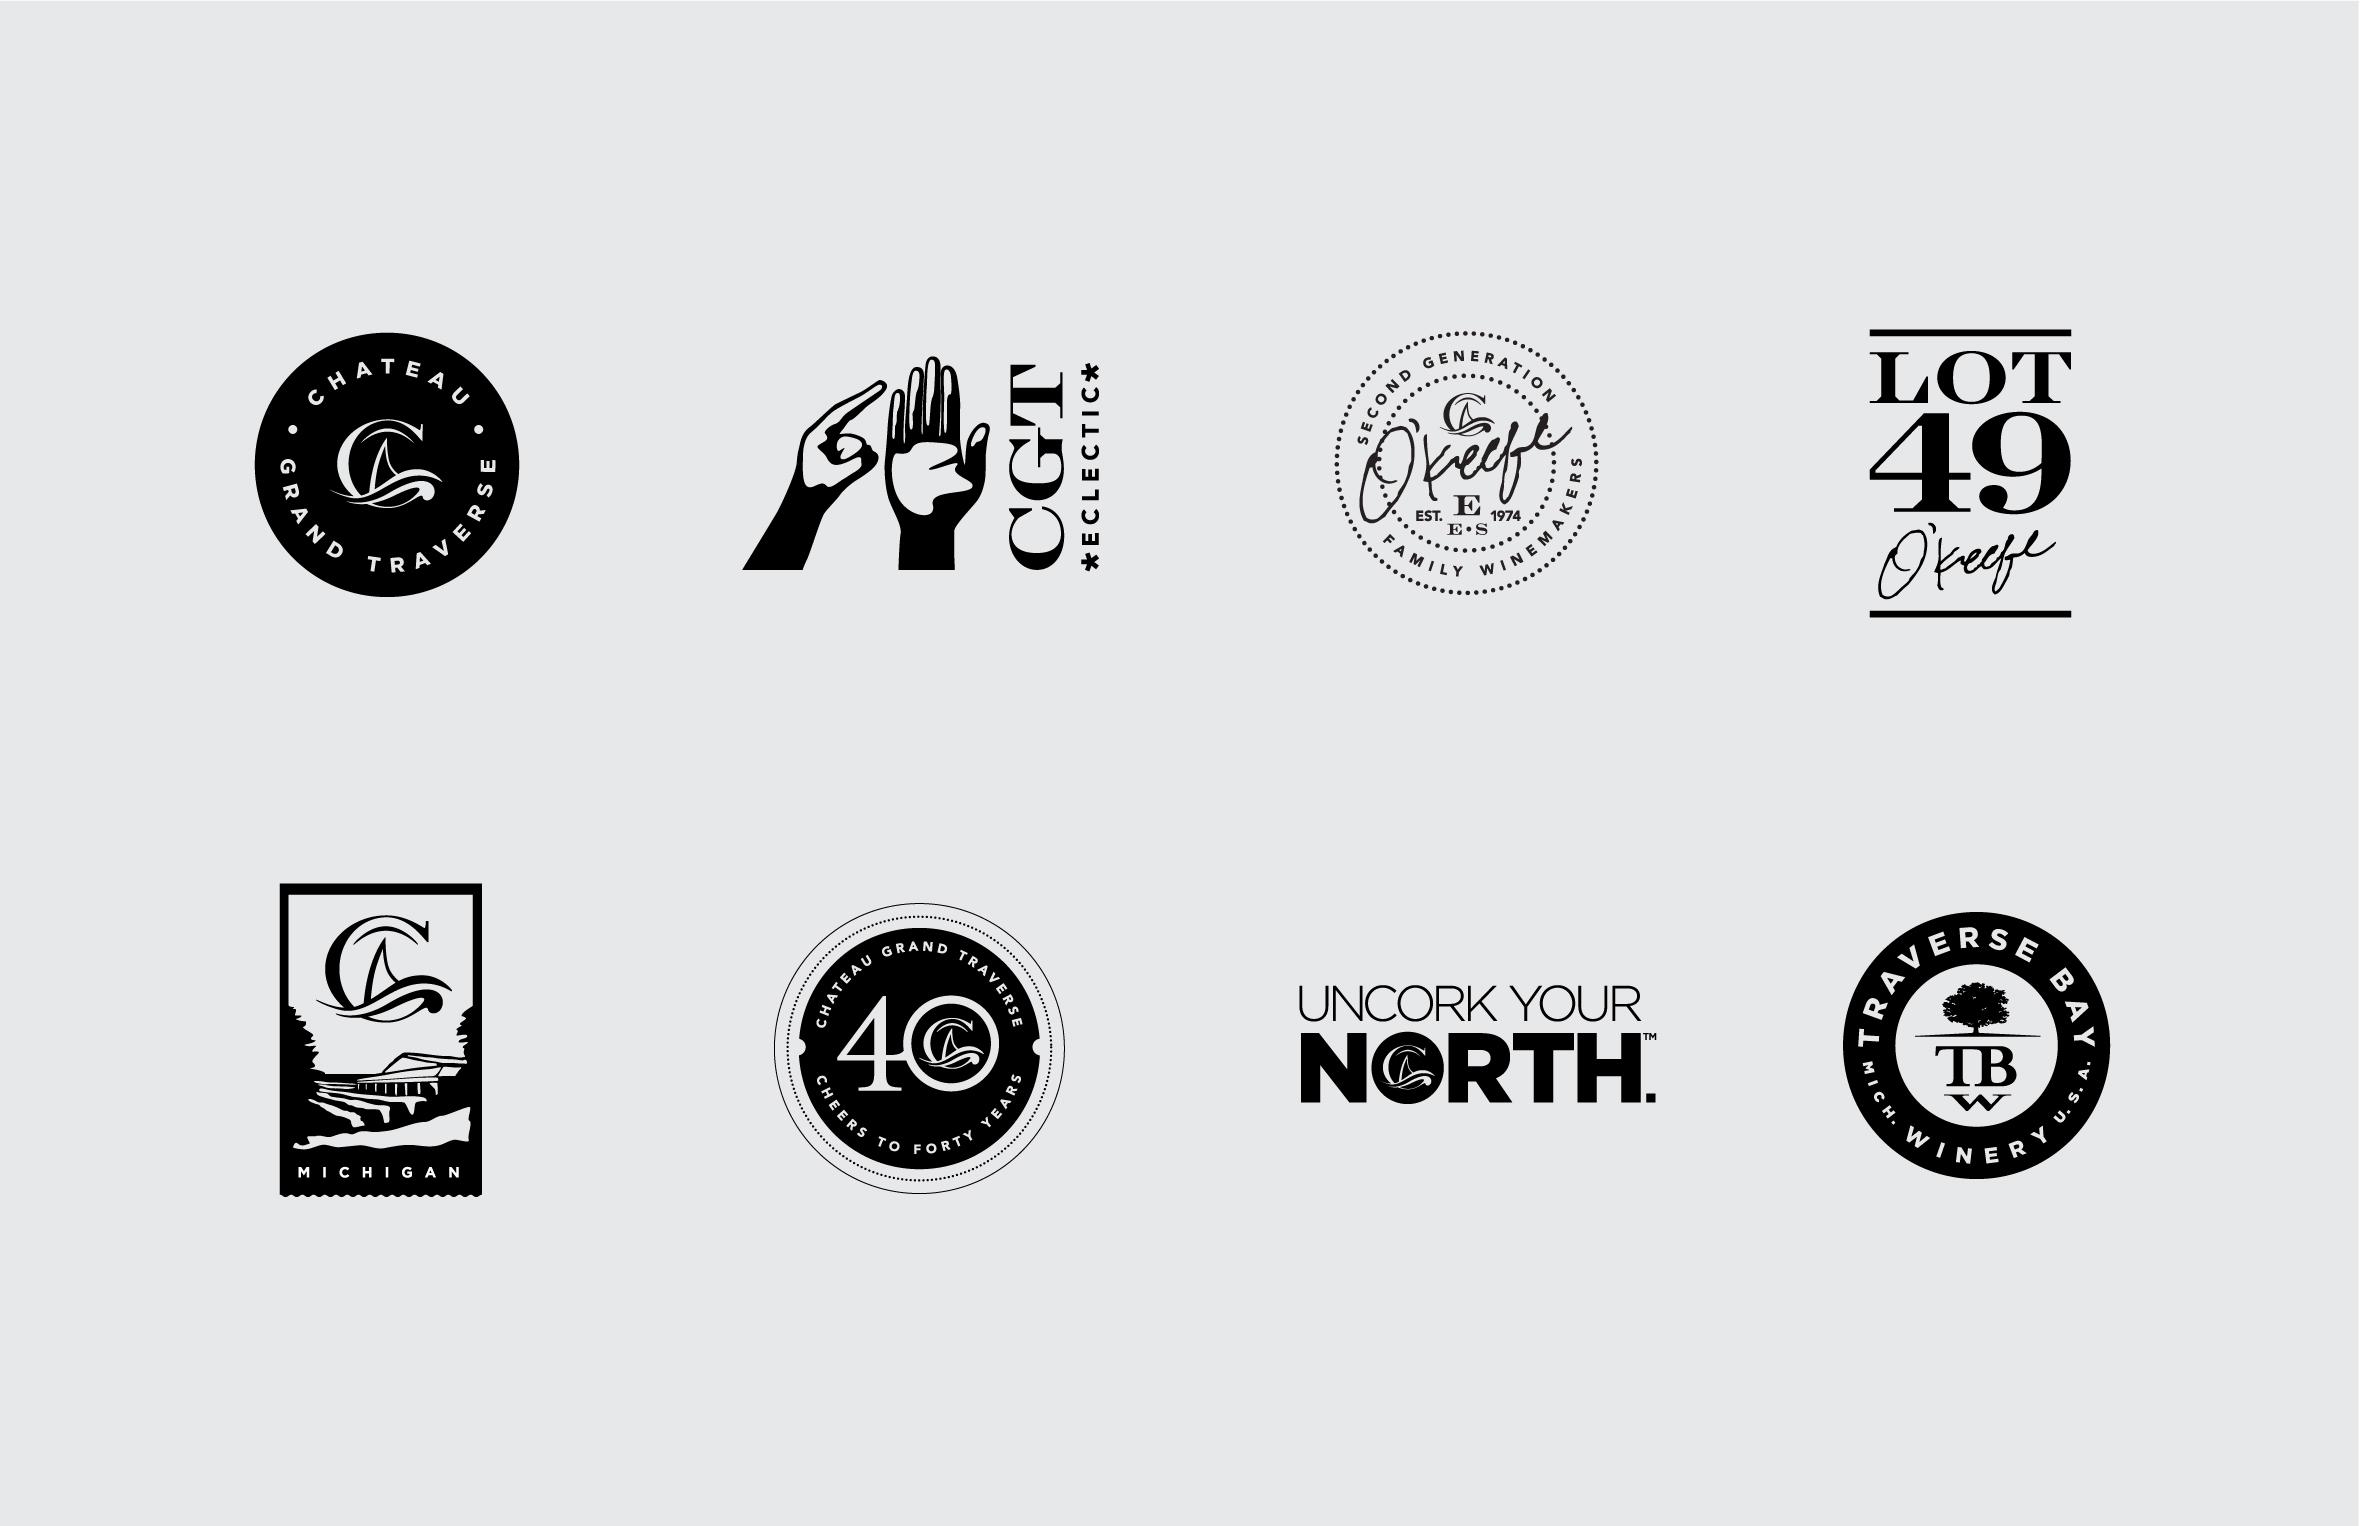 cgt_casestudy_logos